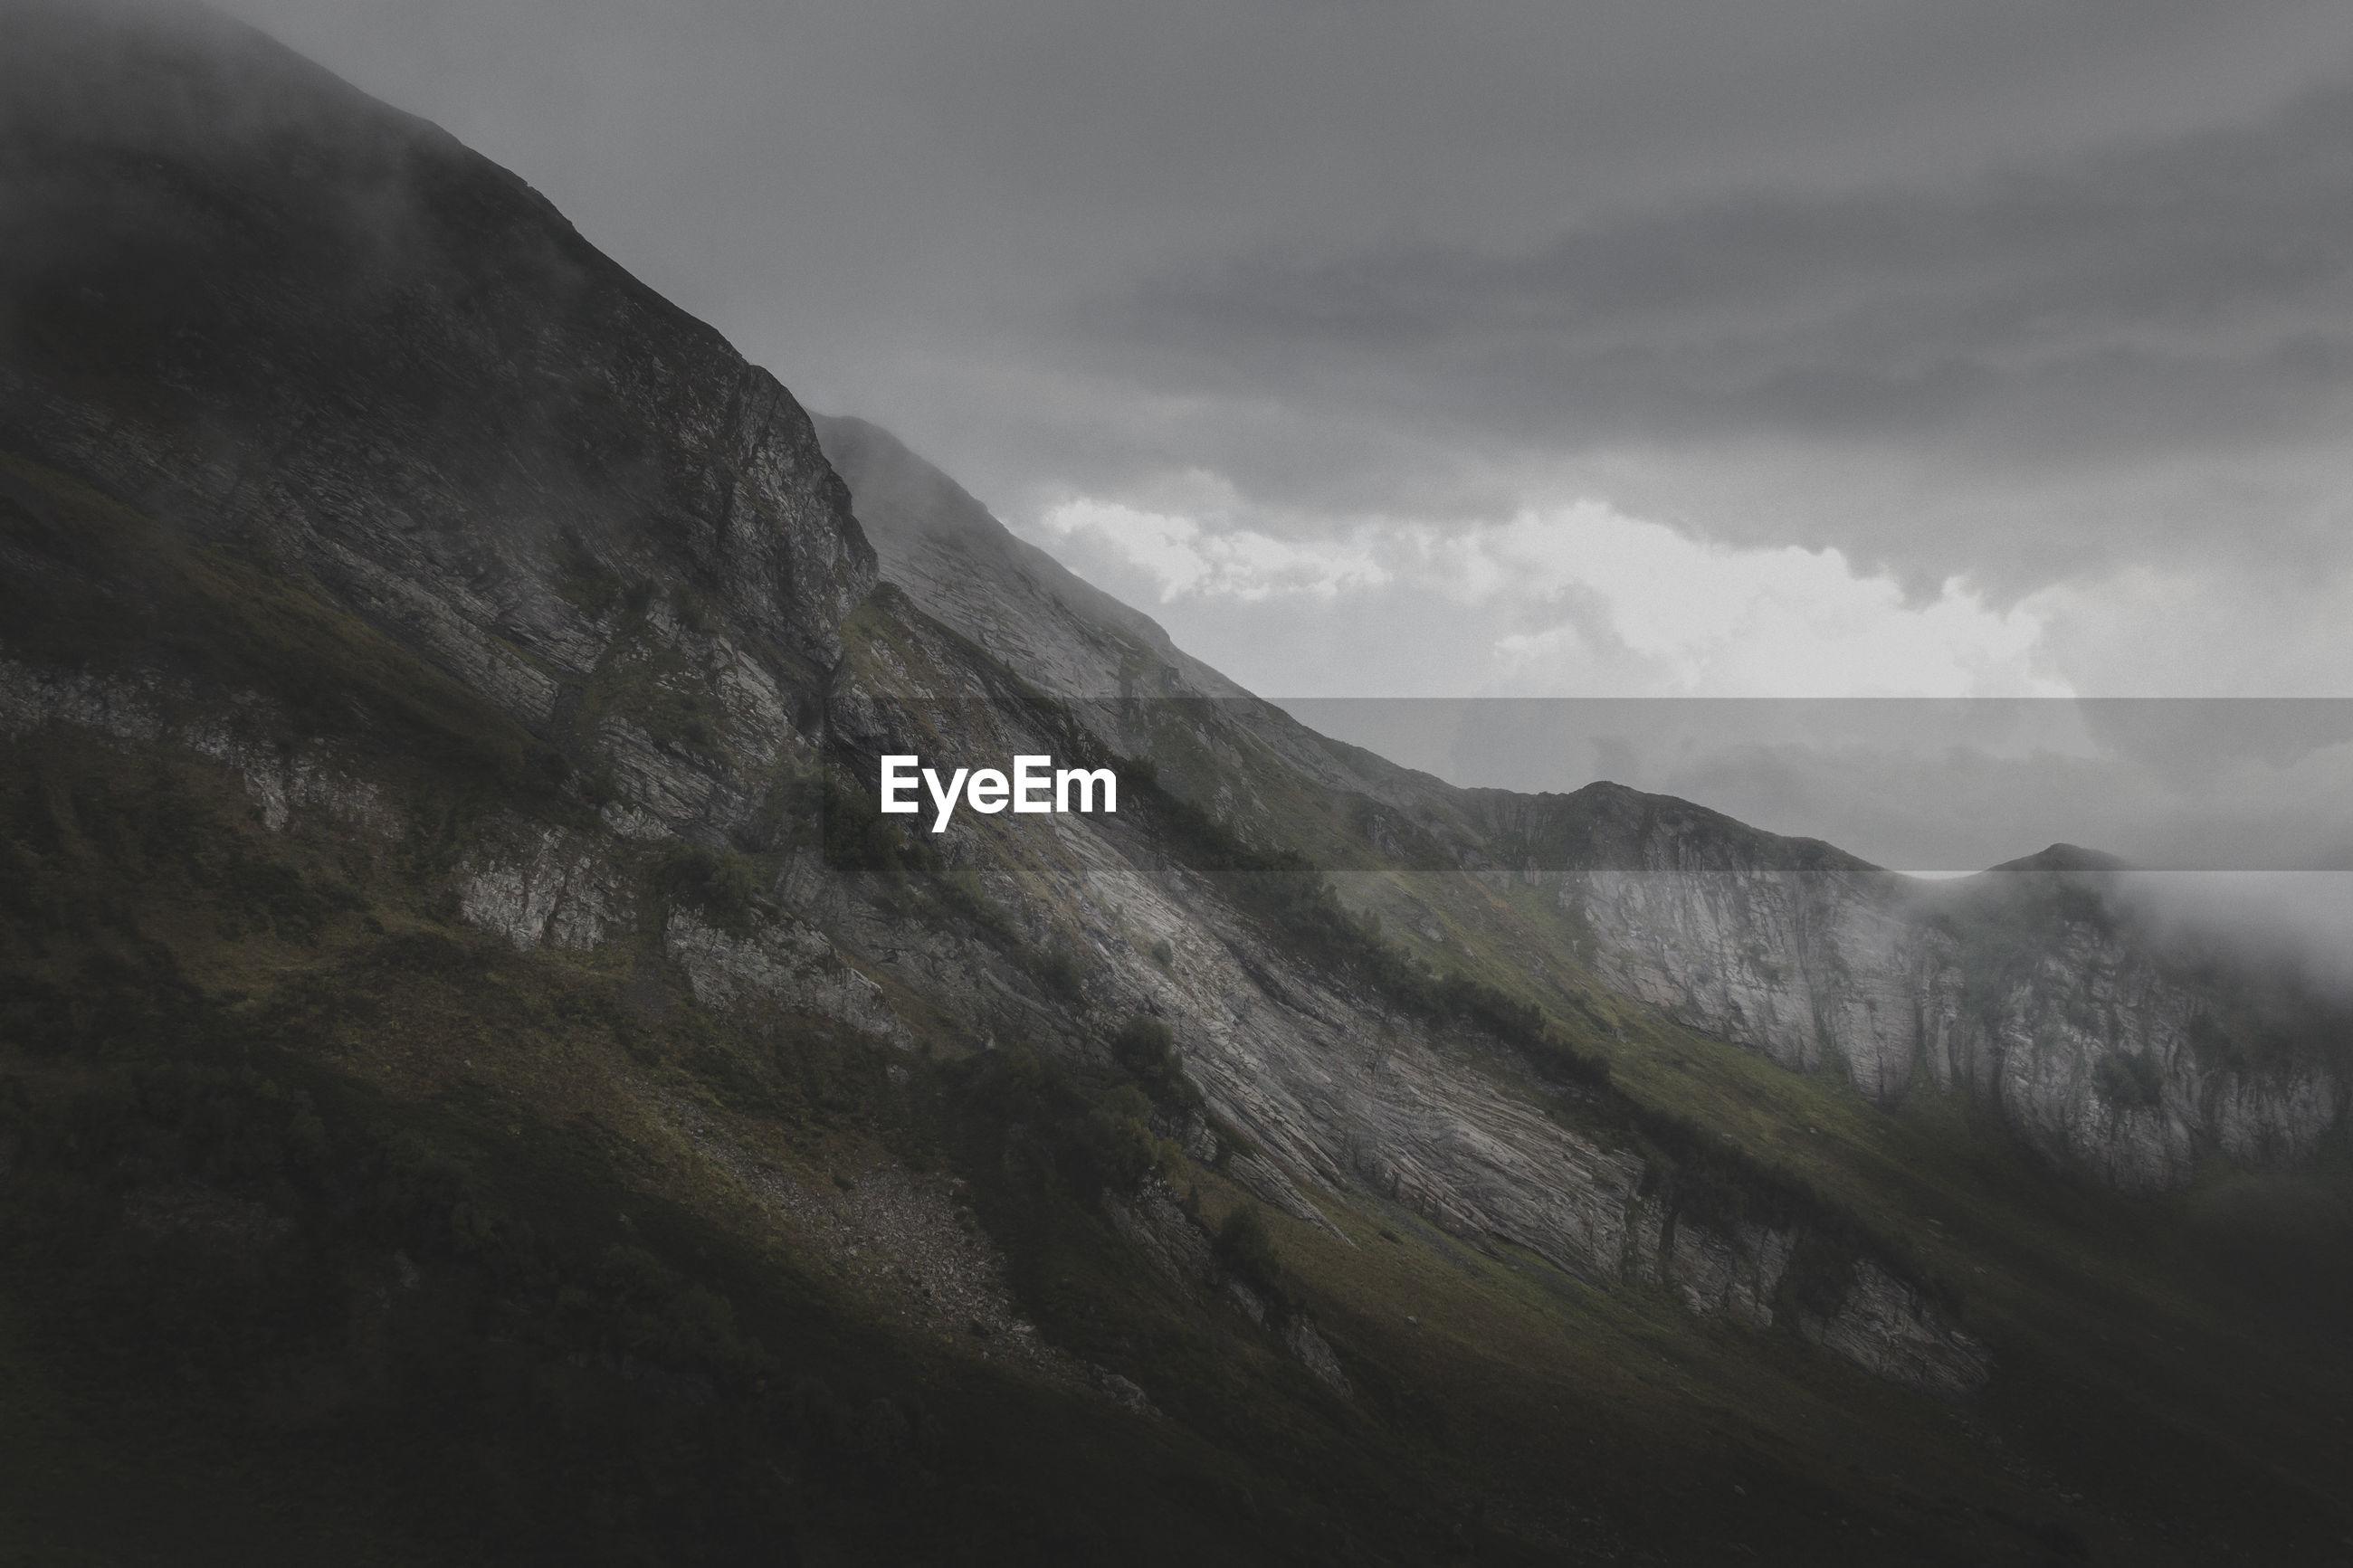 IDYLLIC SHOT OF MOUNTAIN AGAINST SKY